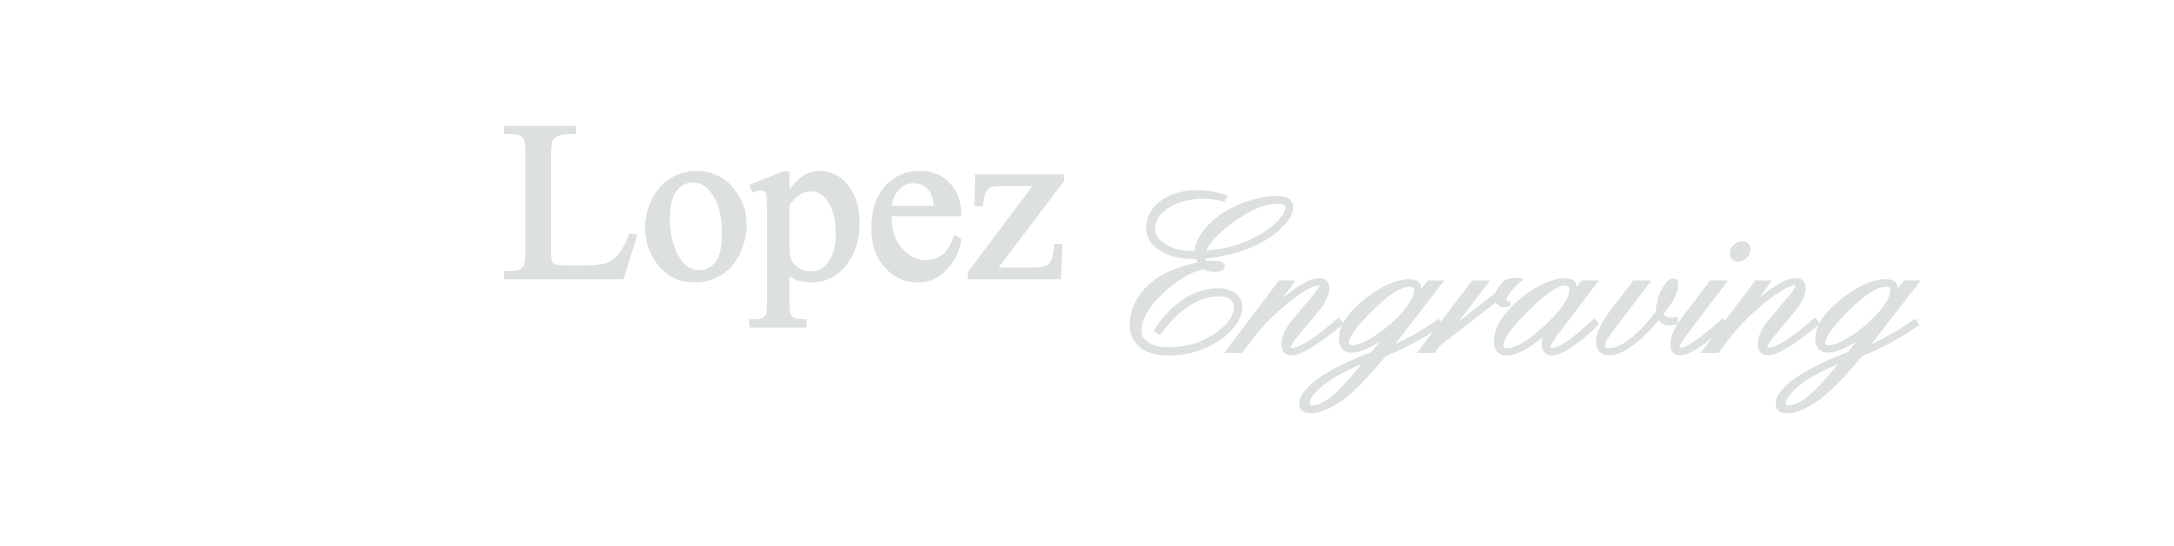 Lopez Engraving